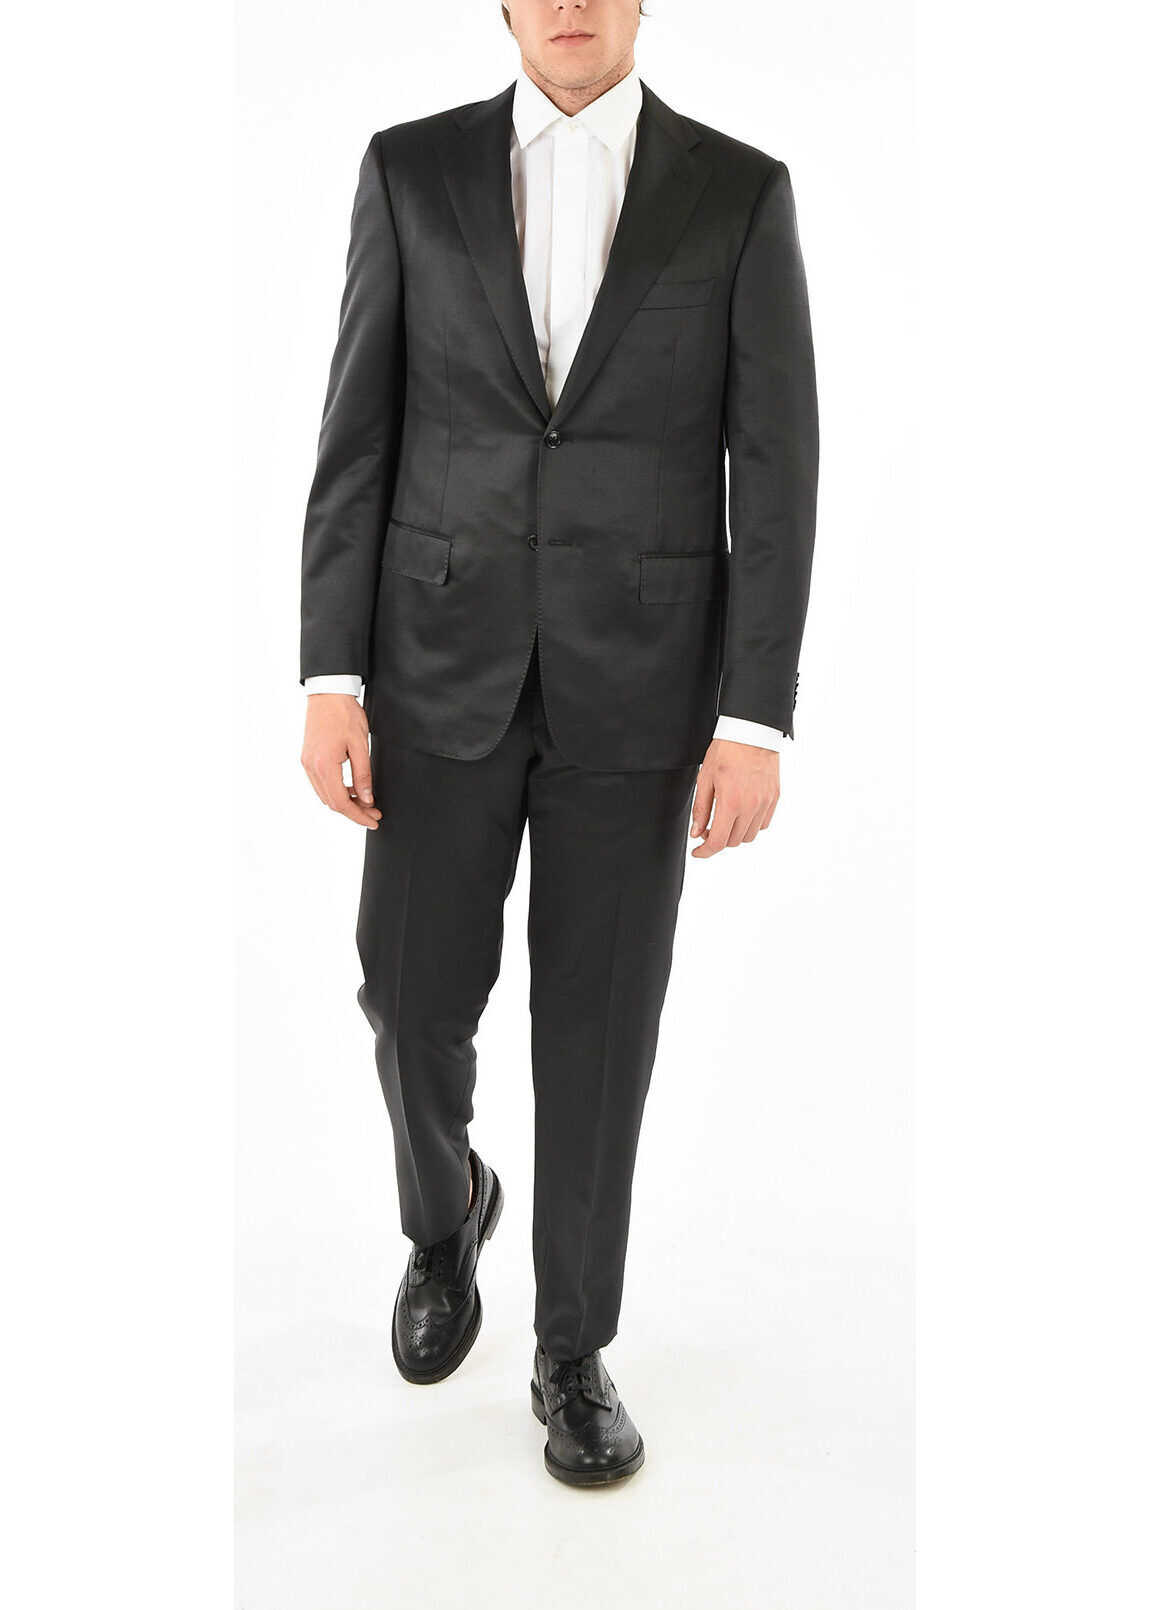 CORNELIANI Silk and Virgin Wool MANTUA Suit BLACK imagine